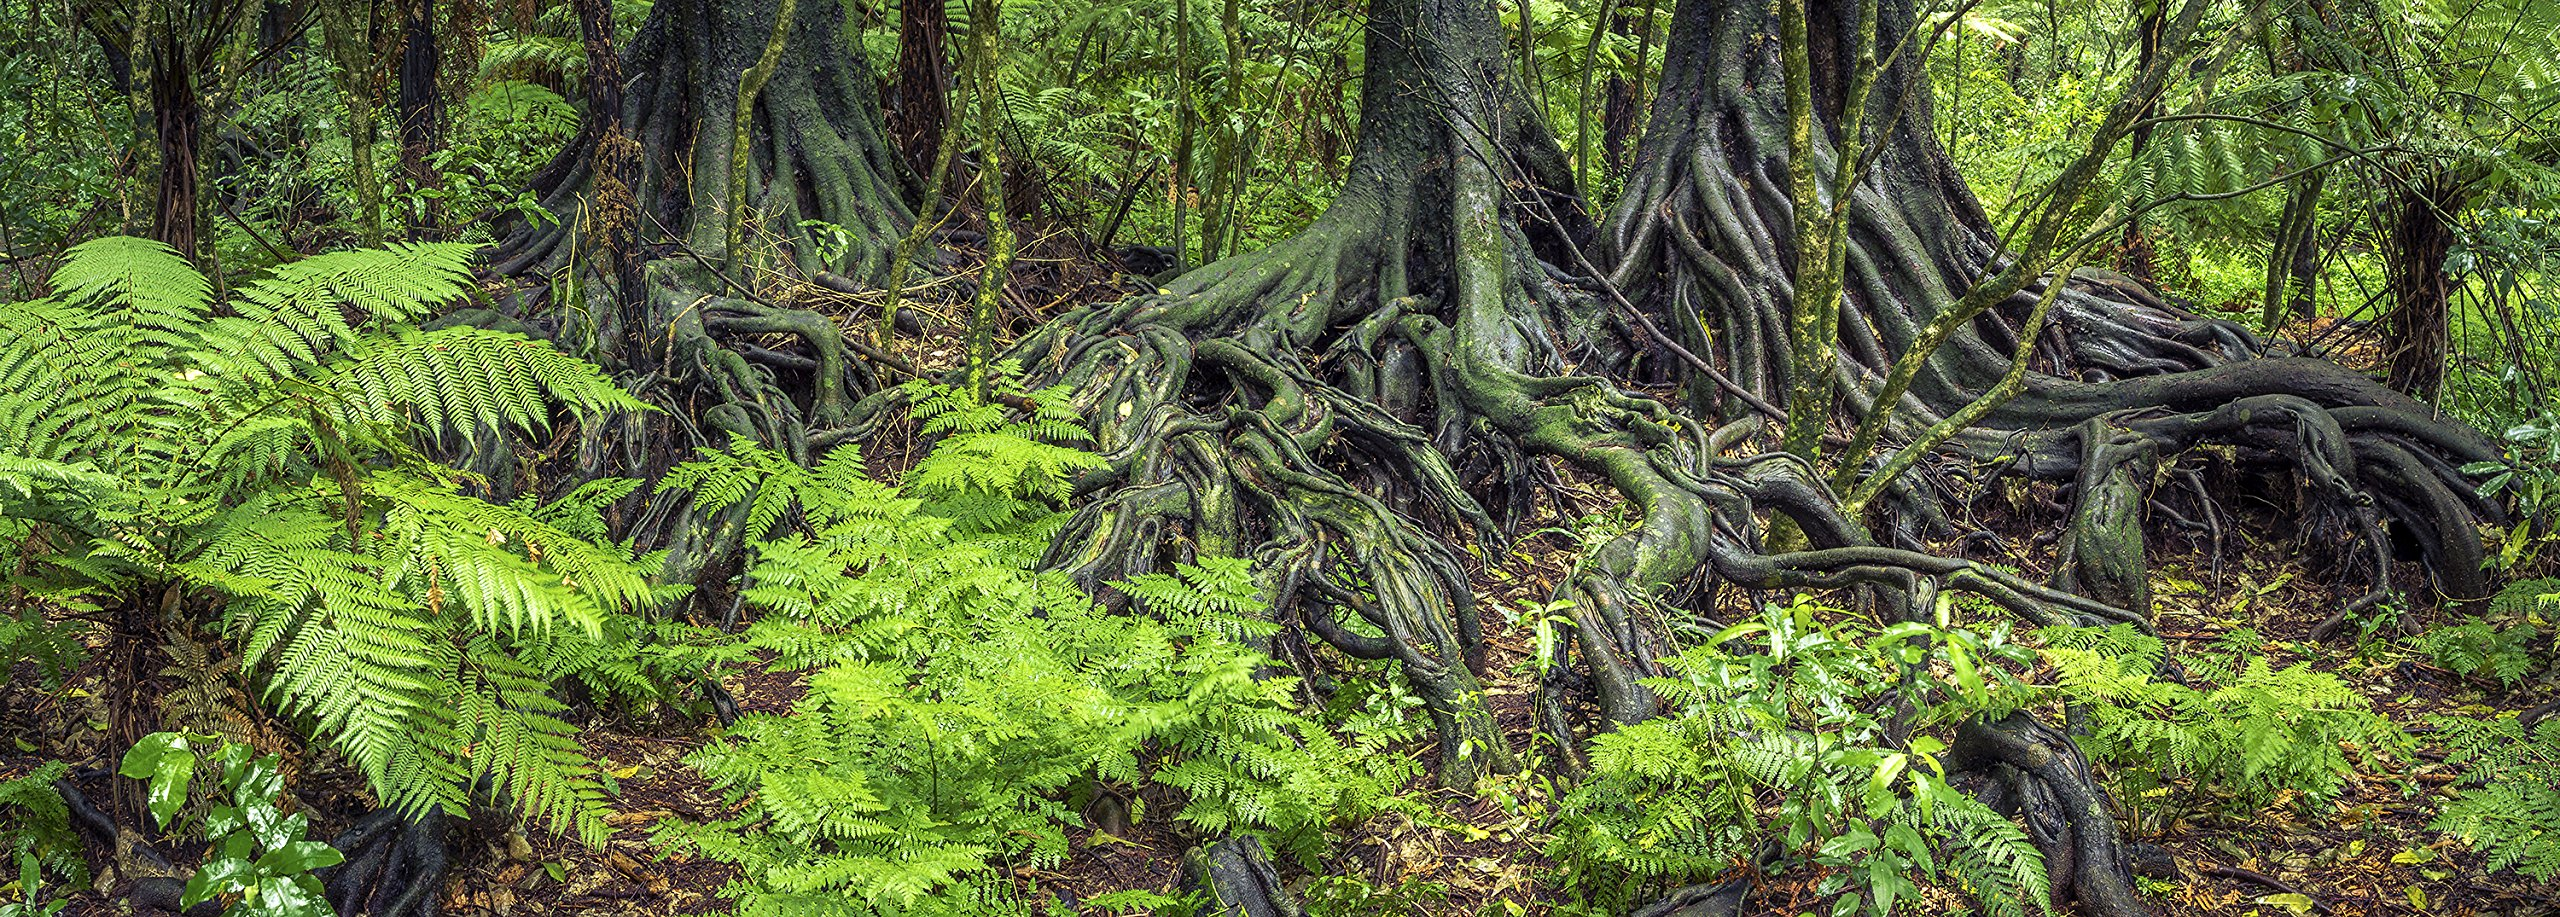 Carolina Custom Cages Reptile Habitat Background; Rain Forest Ferns & Roots for 20L, 3-sided Wraparound